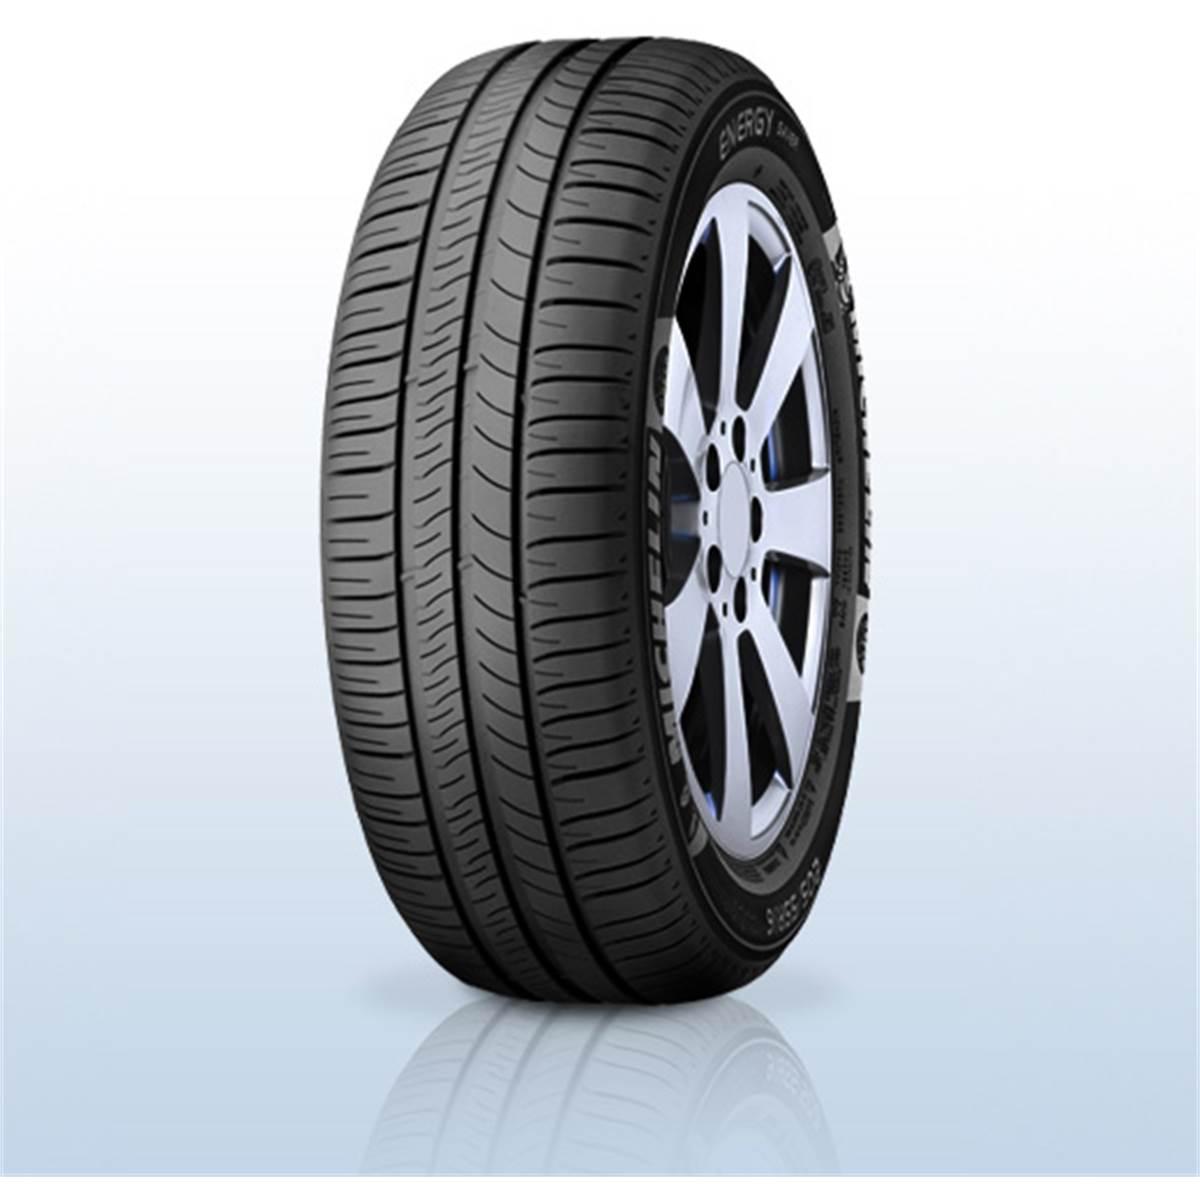 Pneu Michelin 175/65R15 84T Energy Saver +